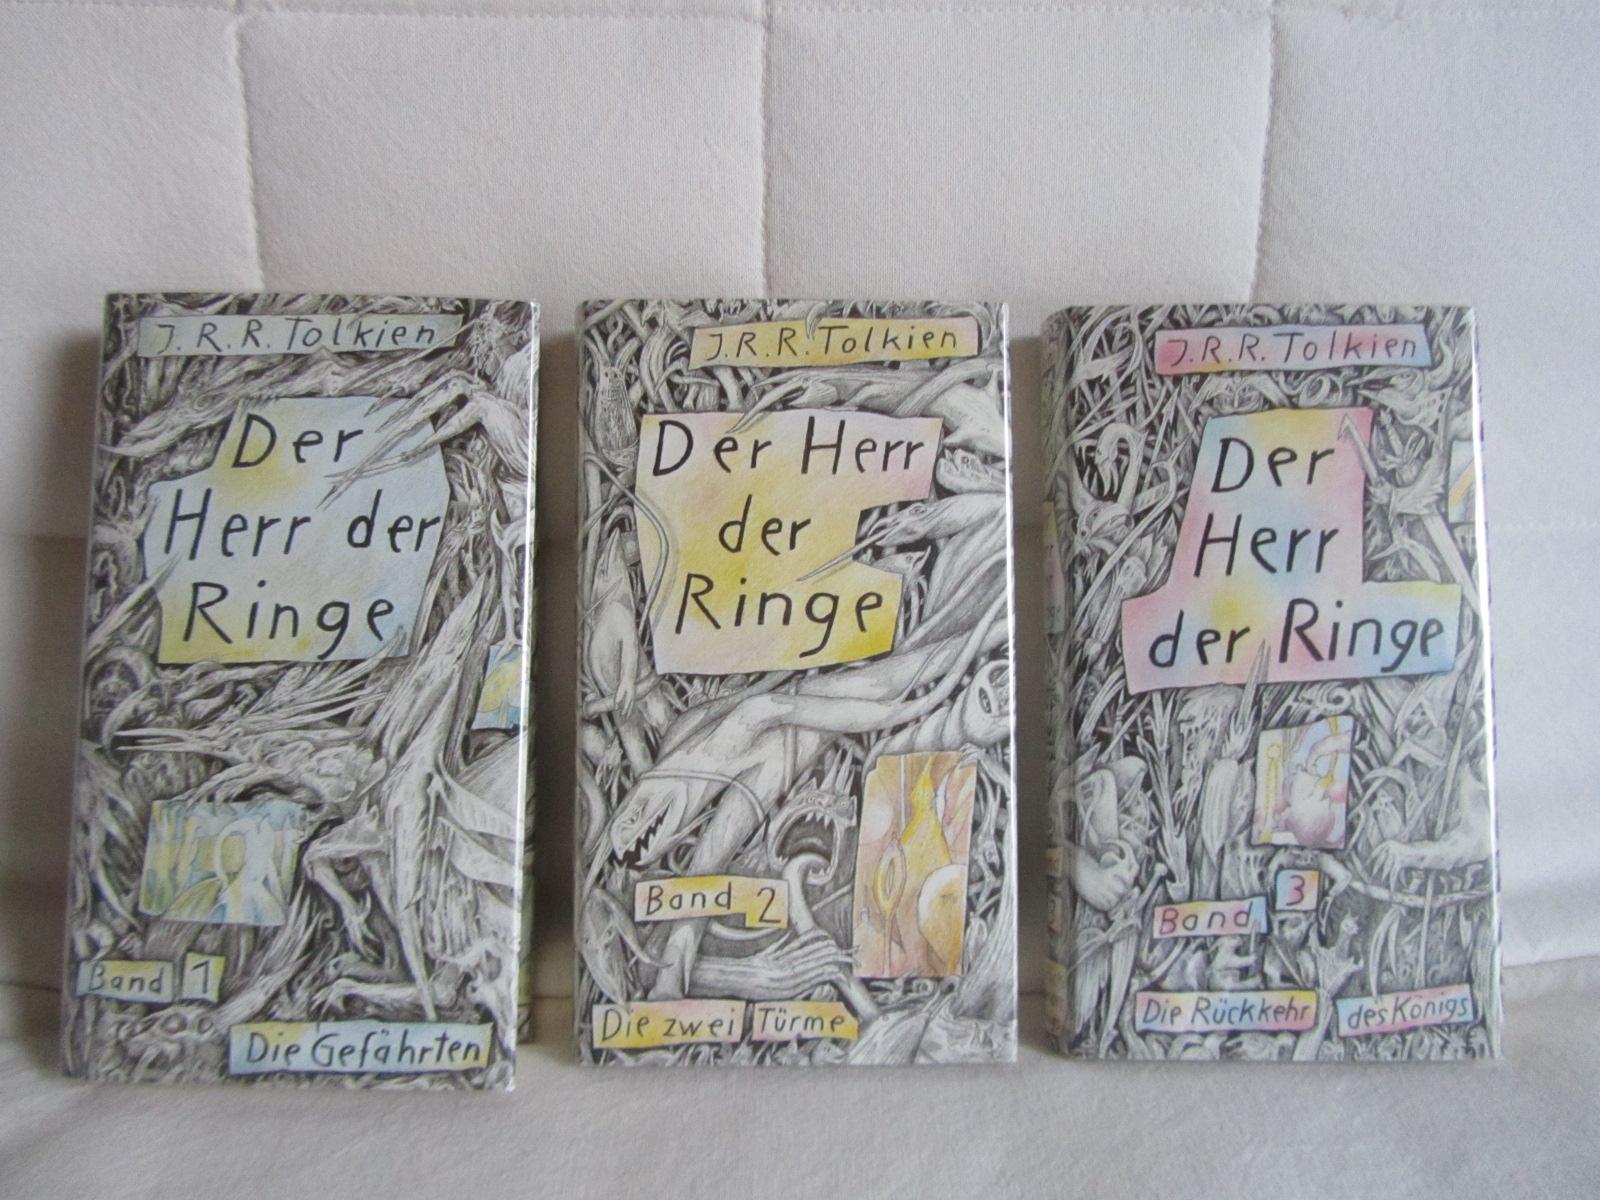 Der Hobbit Live Wallpaper Android Apps Auf Google Play - Gutenberg Herr Ringe Tolkien , HD Wallpaper & Backgrounds